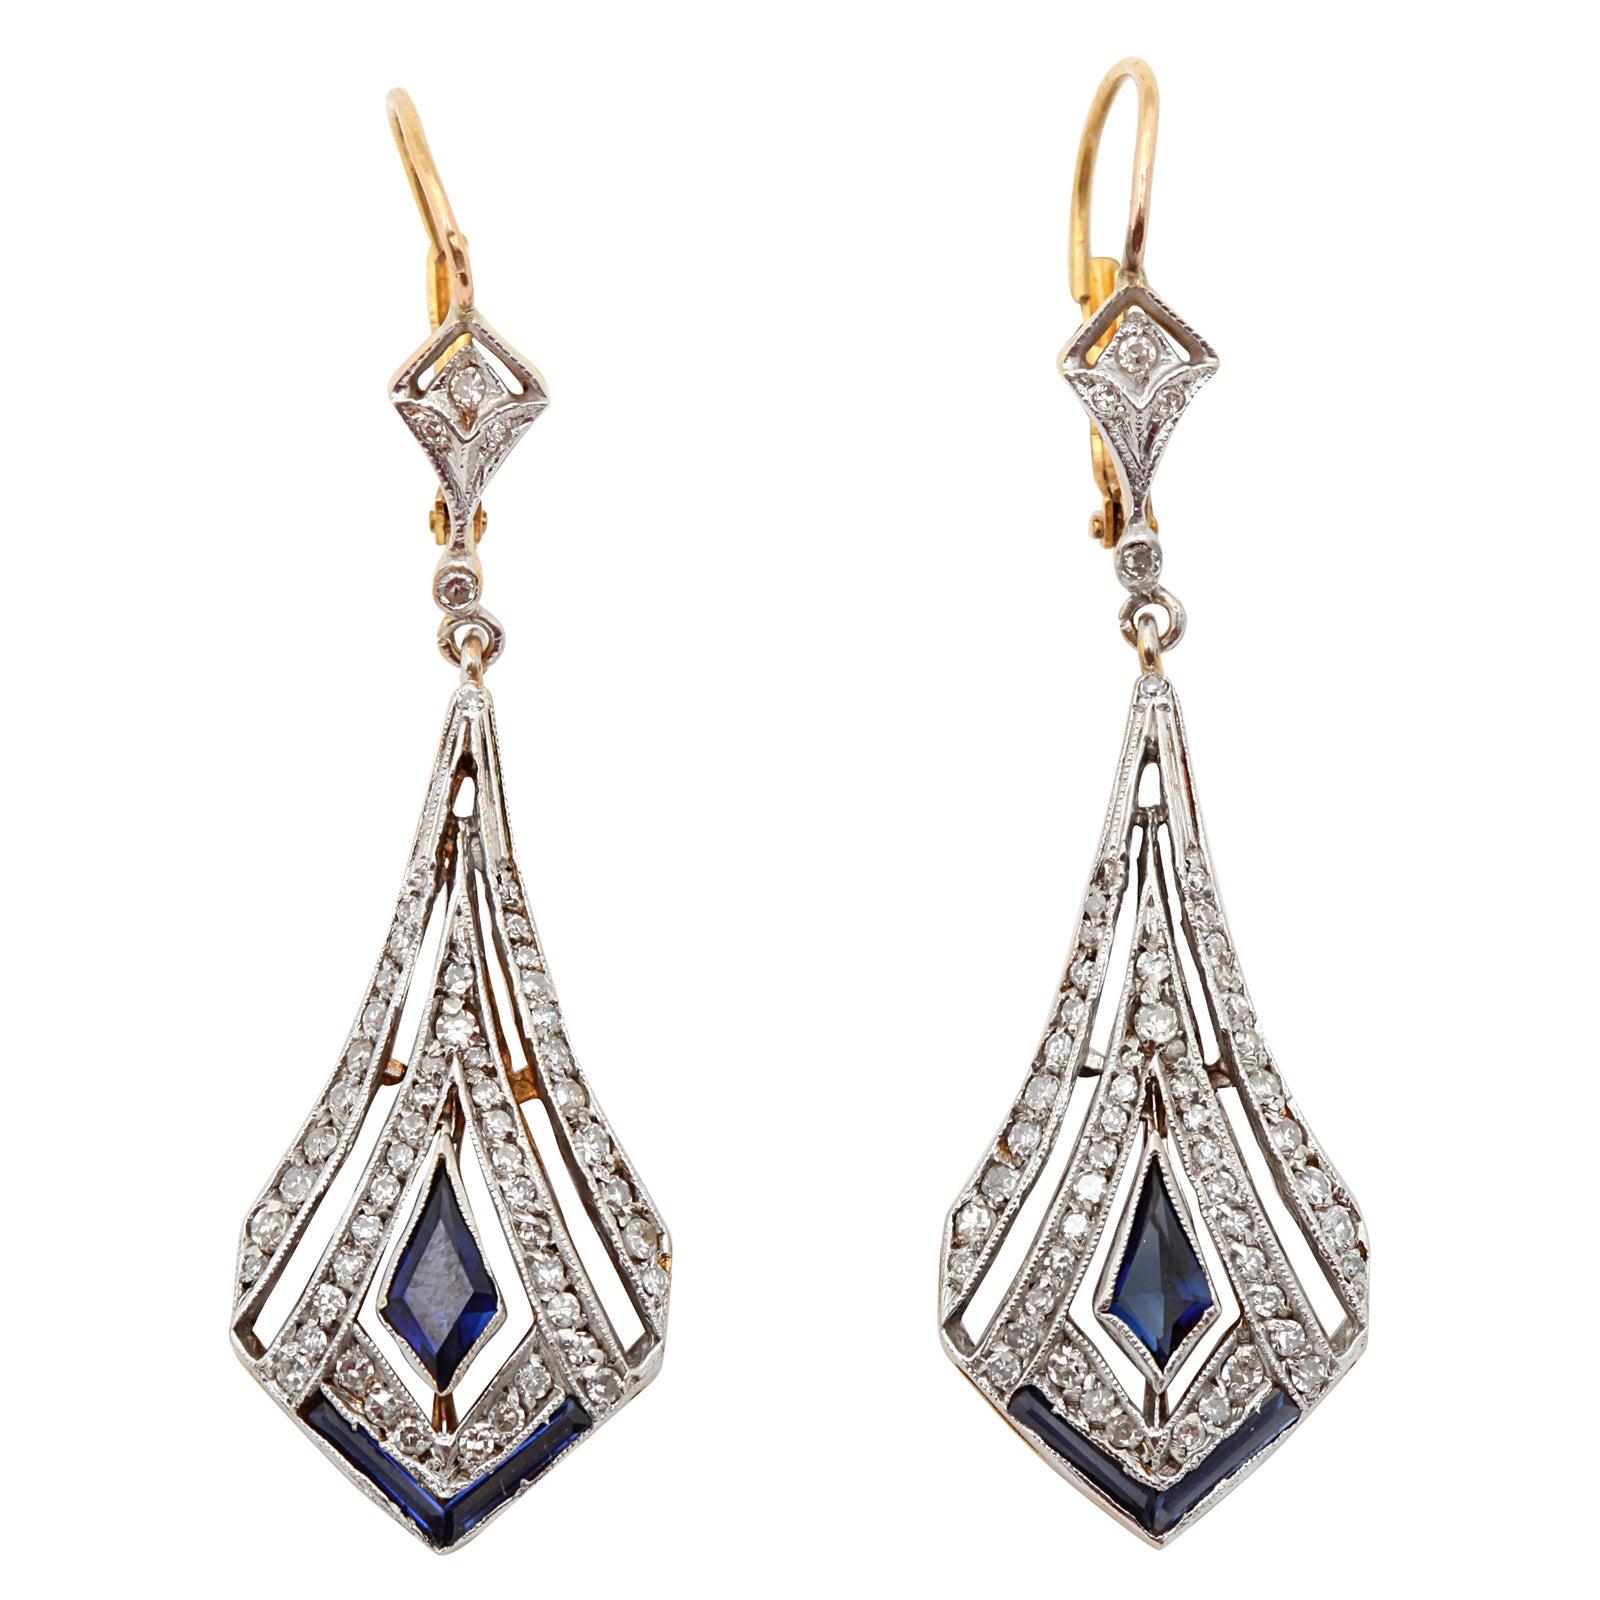 art deco sapphire and diamond drop earrings at 1stdibs. Black Bedroom Furniture Sets. Home Design Ideas